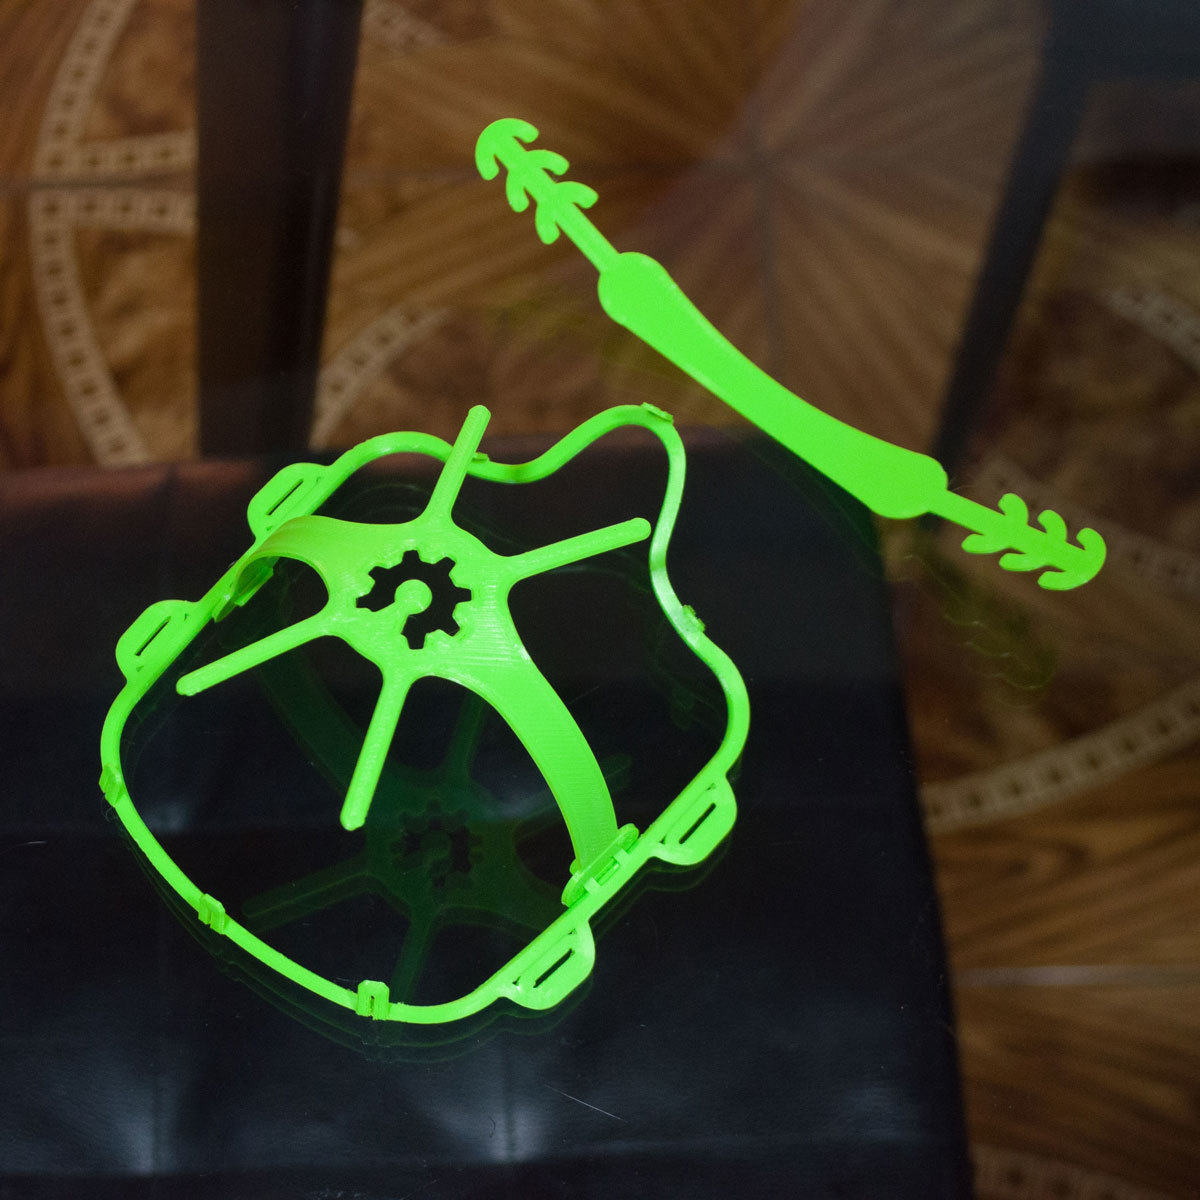 7.jpg Download free STL file Hermetic Mask • 3D print design, Checho3d